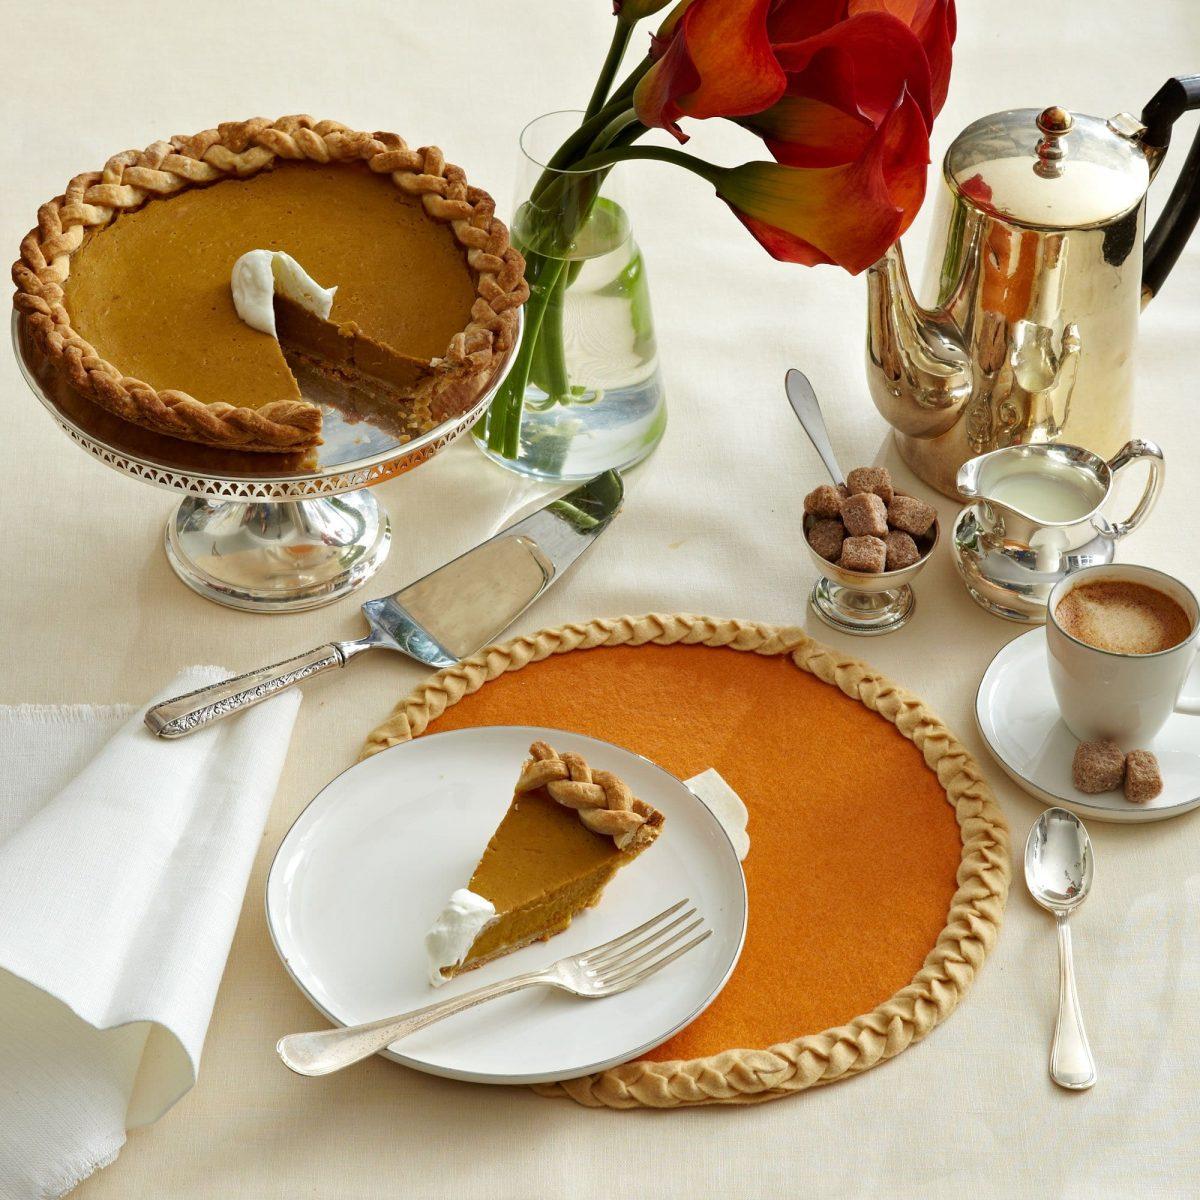 Darcy Miller Designs Felt Pies Thanksgiving, Pie, Pumpkin Pie, Cherry Pie, Felt Craft, Downloadable Template, DIY placemat, DIY Trivet, Coaster, Table Décor